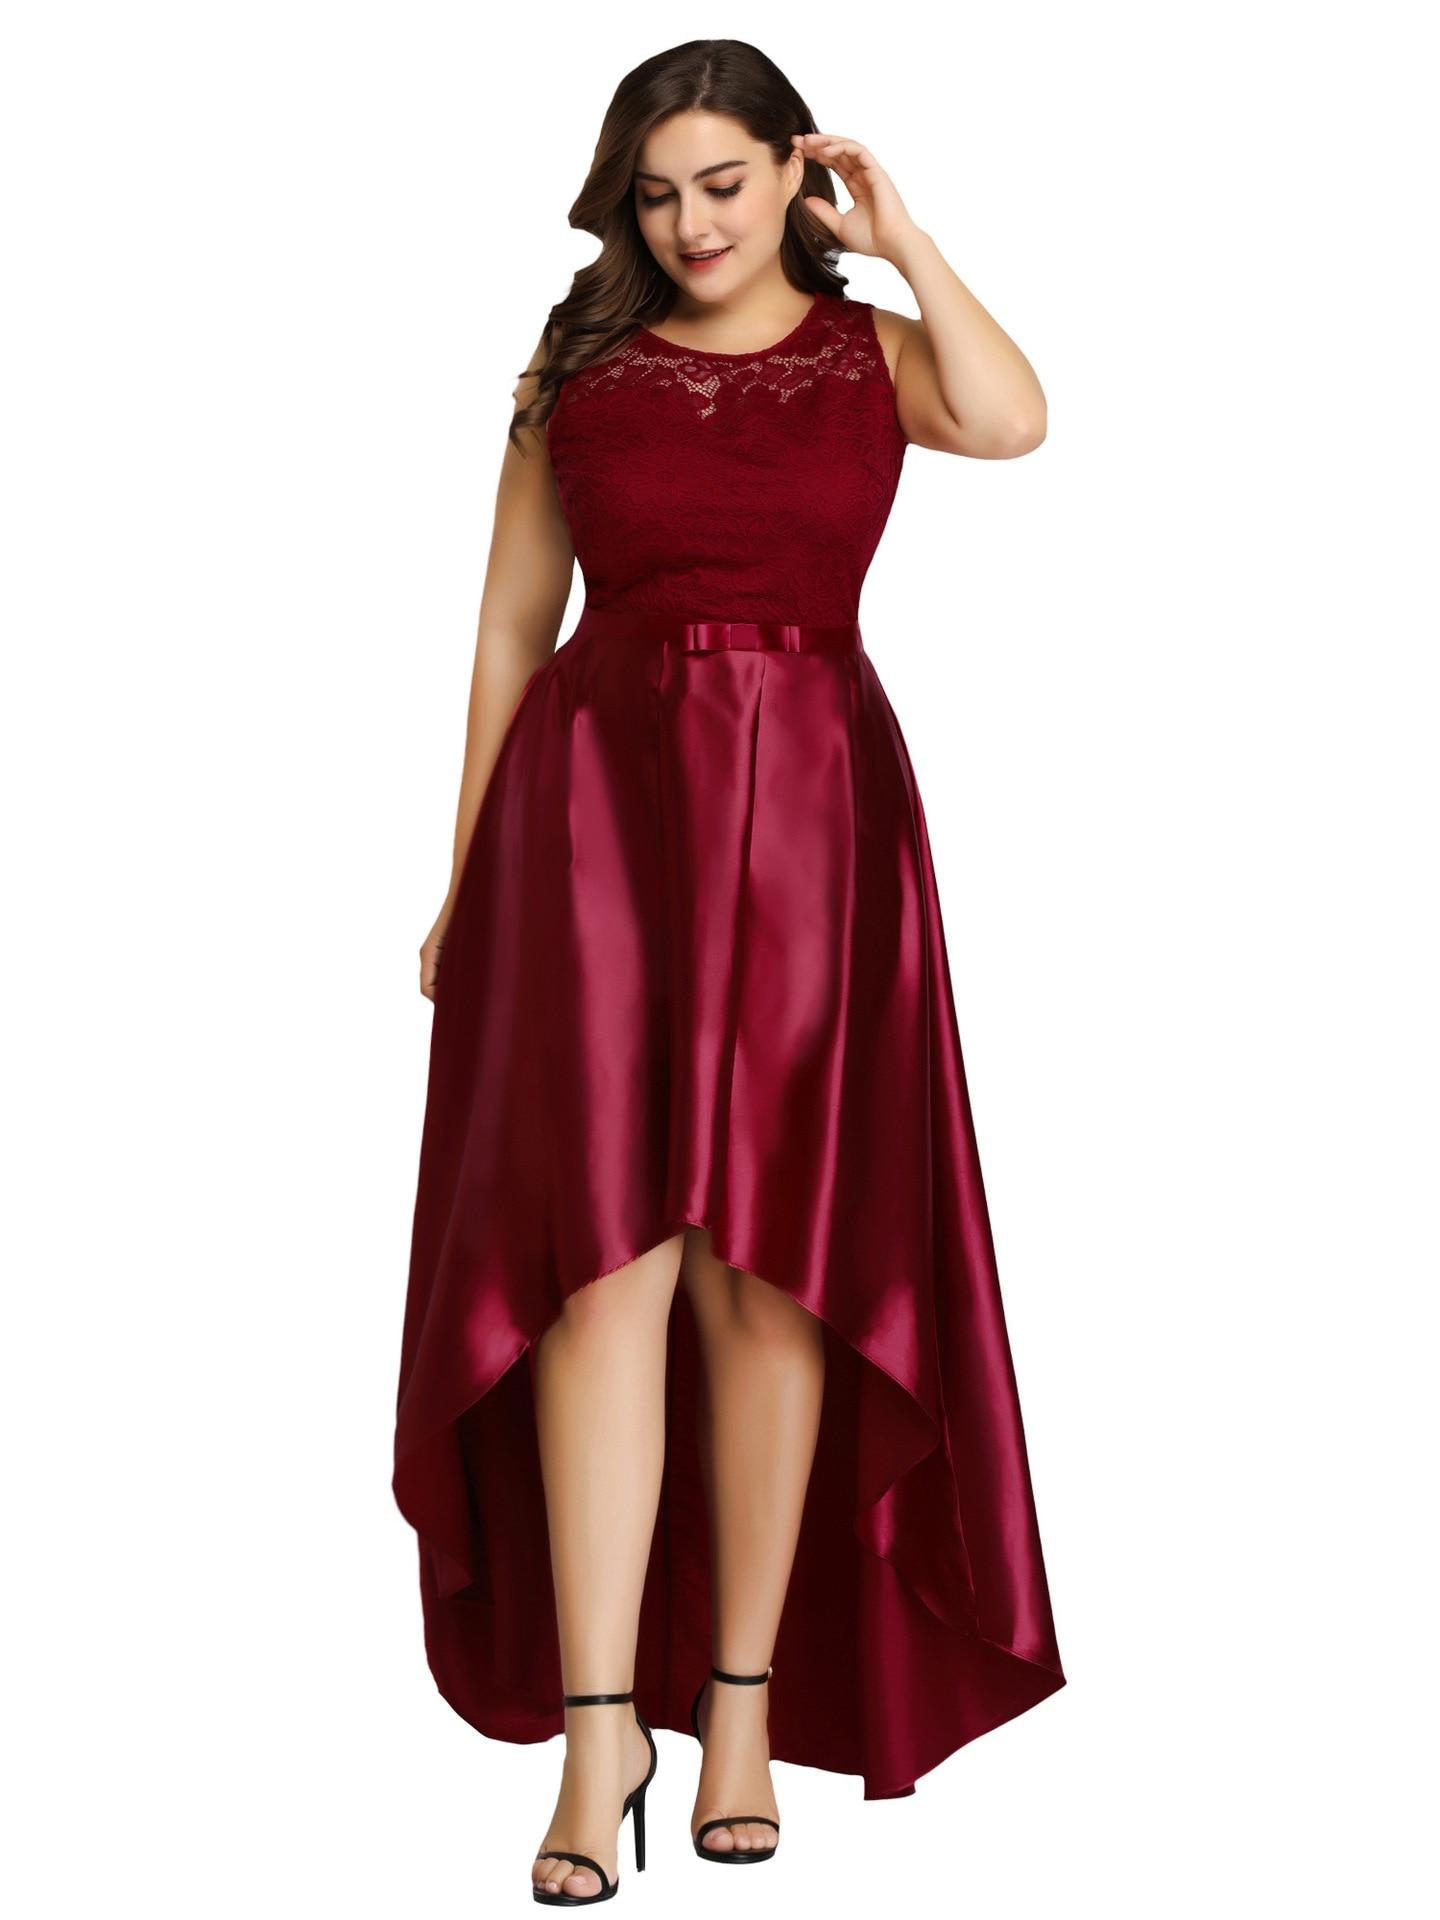 Plus Size Evening Dresses2019 New XL Lace High Waist Slim Slim Evening Dress Female Host Banquet XL Formal Evening Dress